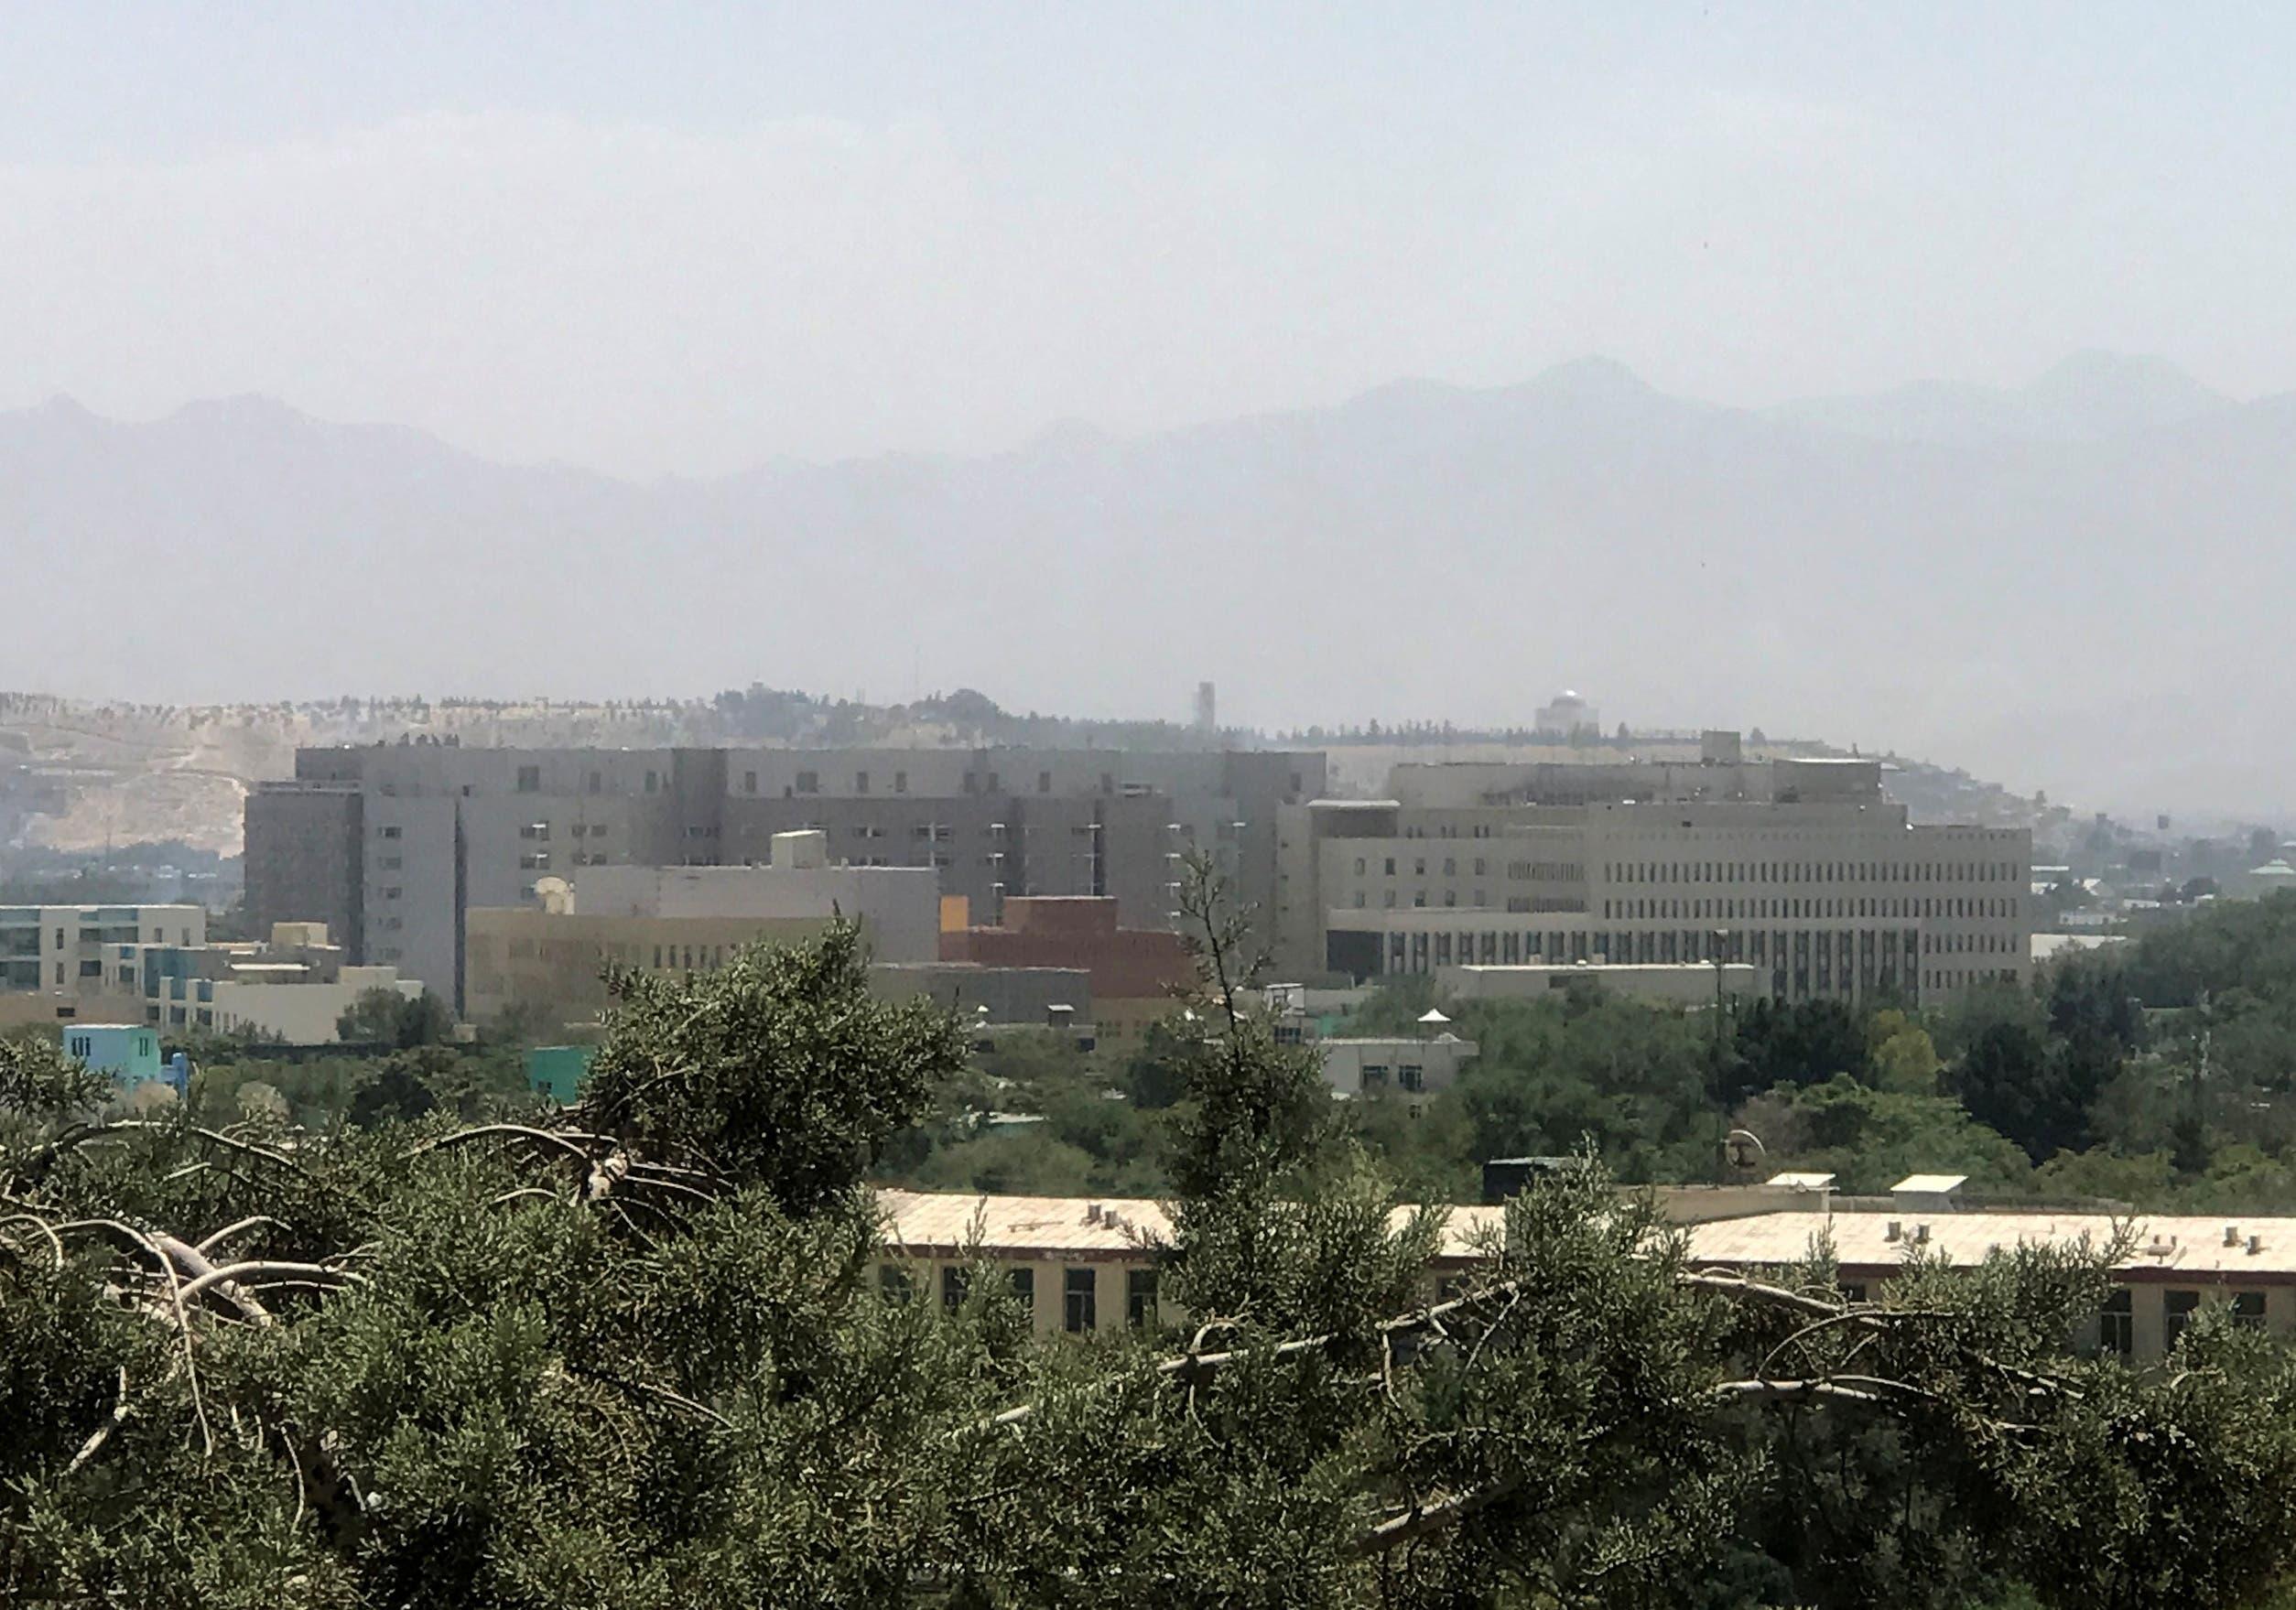 کابل کا عمومی منظر